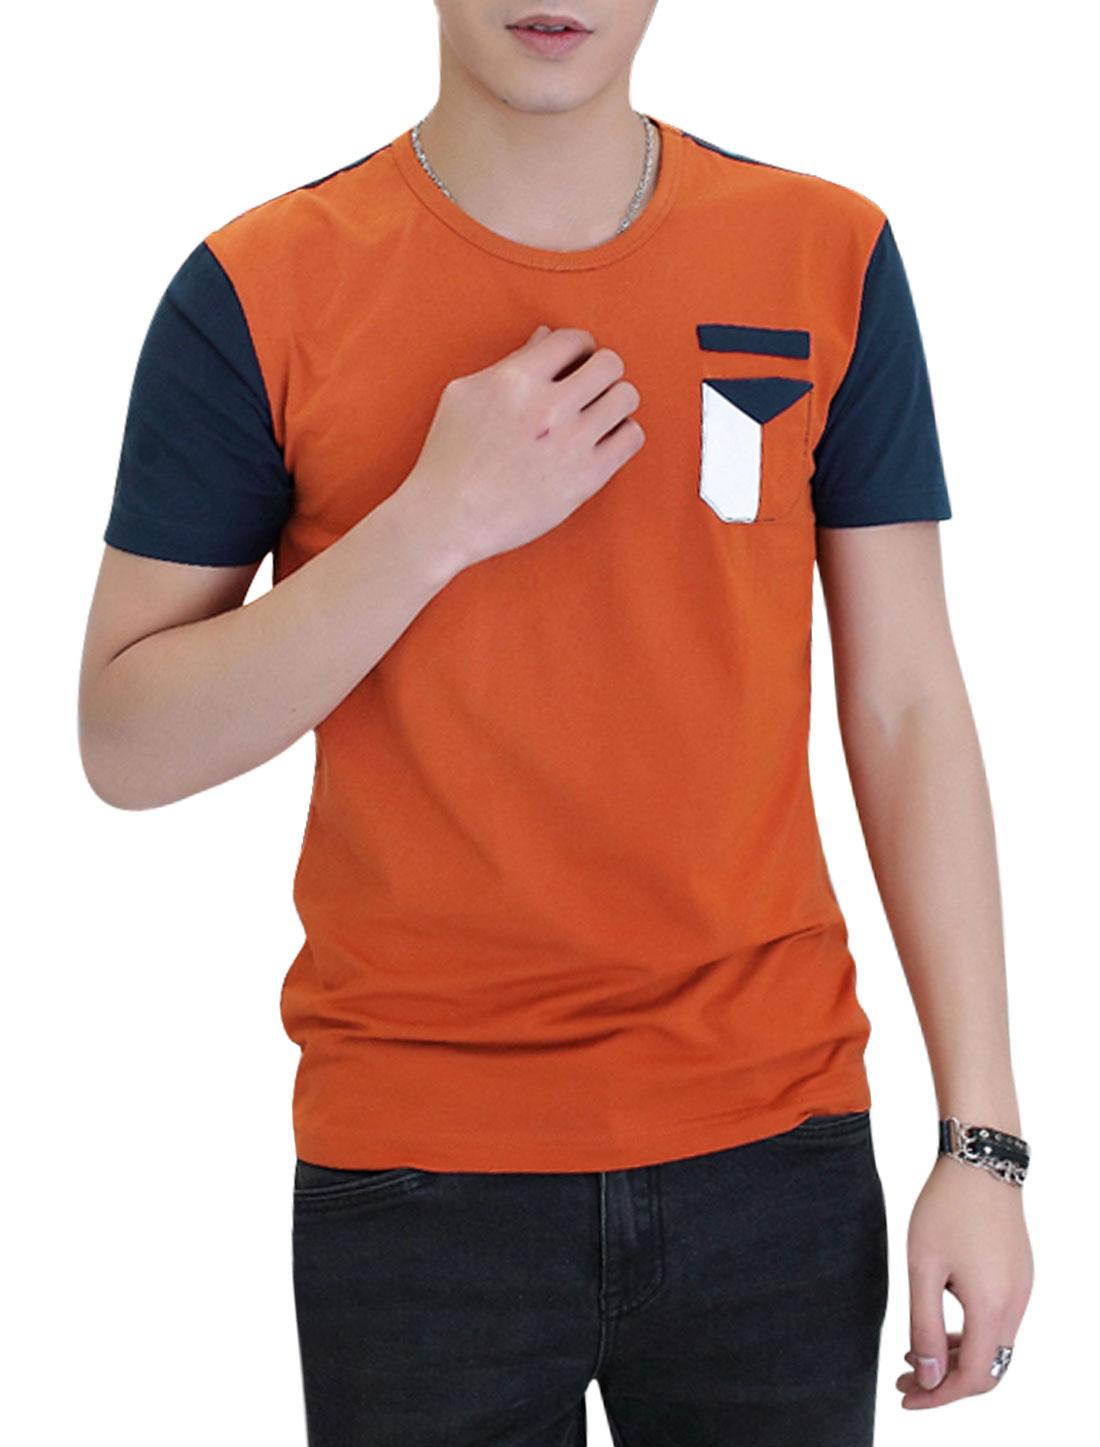 Men Short Sleeve Round Neck Contrast Color Pocket Casual T Shirt Orange M